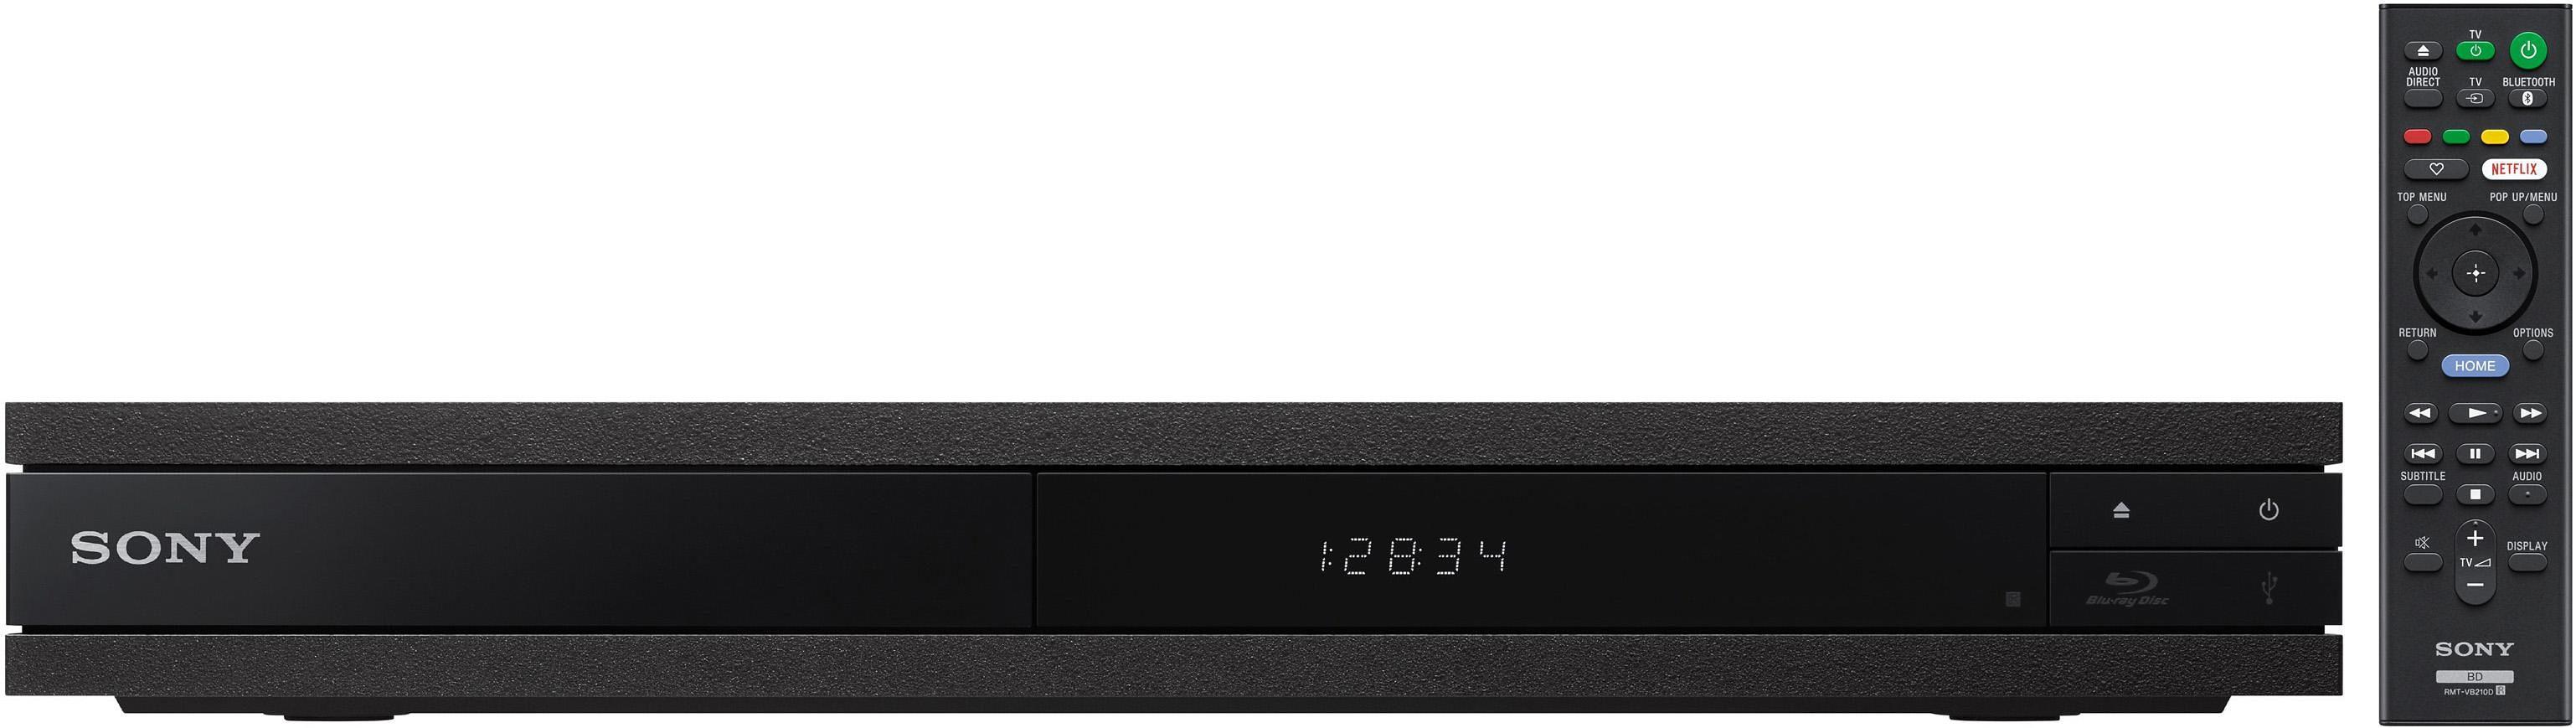 Sony UHP-H1 3D Blu-ray-Player, Hi-Res, 3D-fähig, 4K UHD-Upscaling (60p), Bluetooth, Multiroom, WLAN